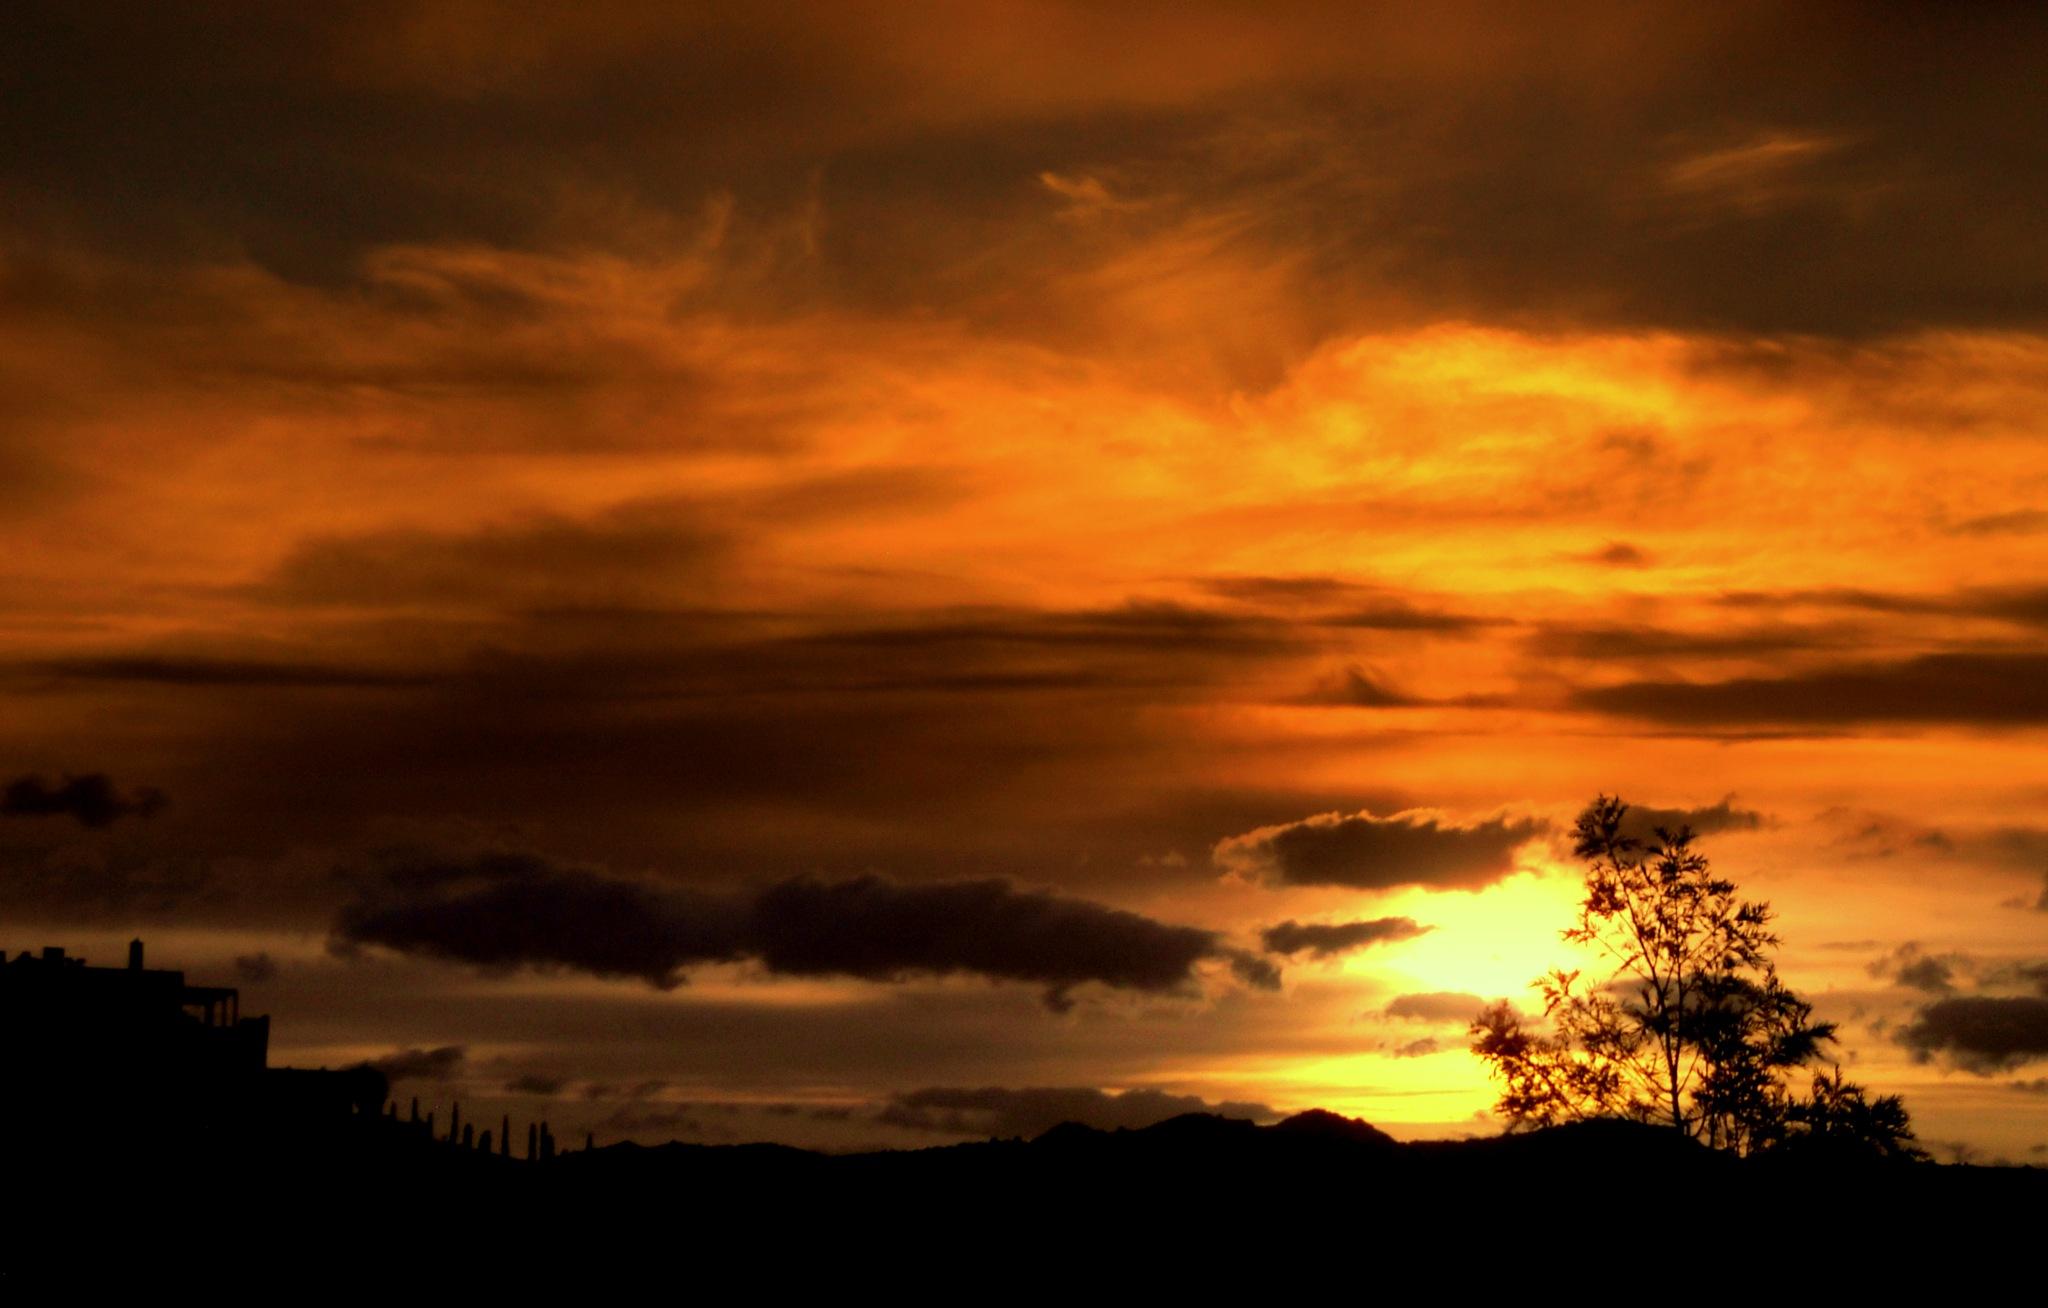 FORGOTTEN SUNSETS 108 by Akin Saner